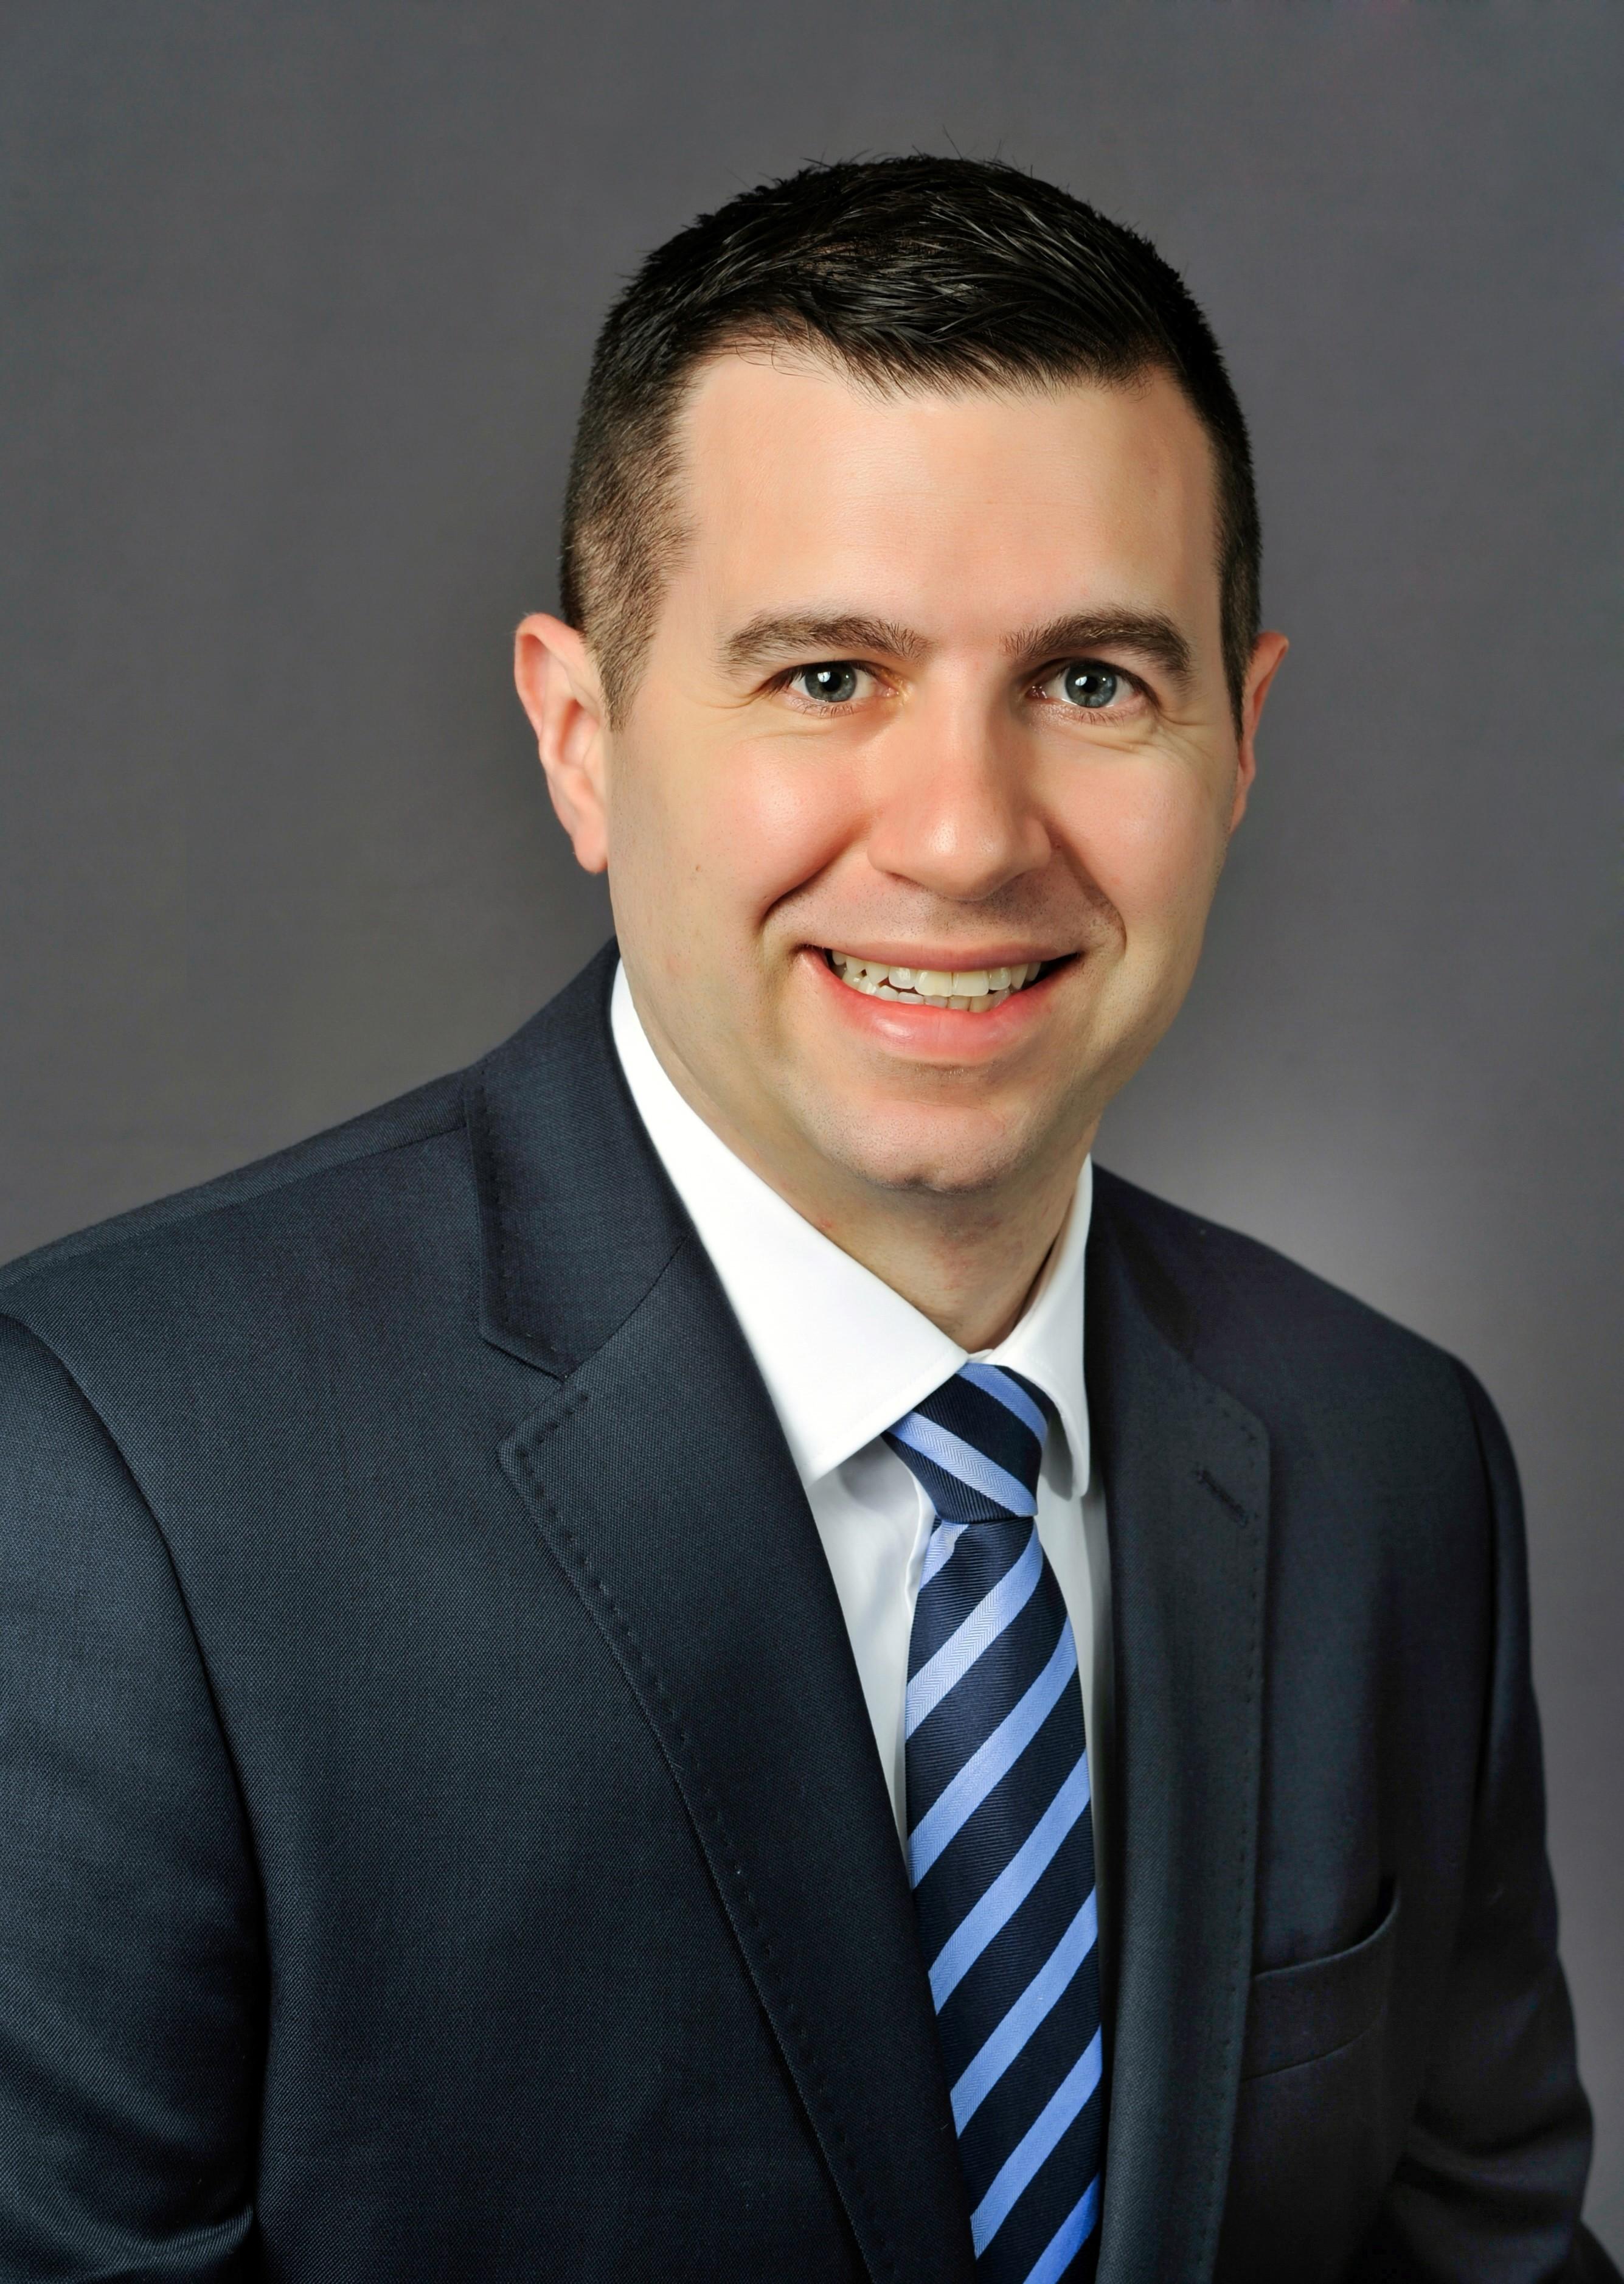 Atkore International Announces John Deitzer to Join Company